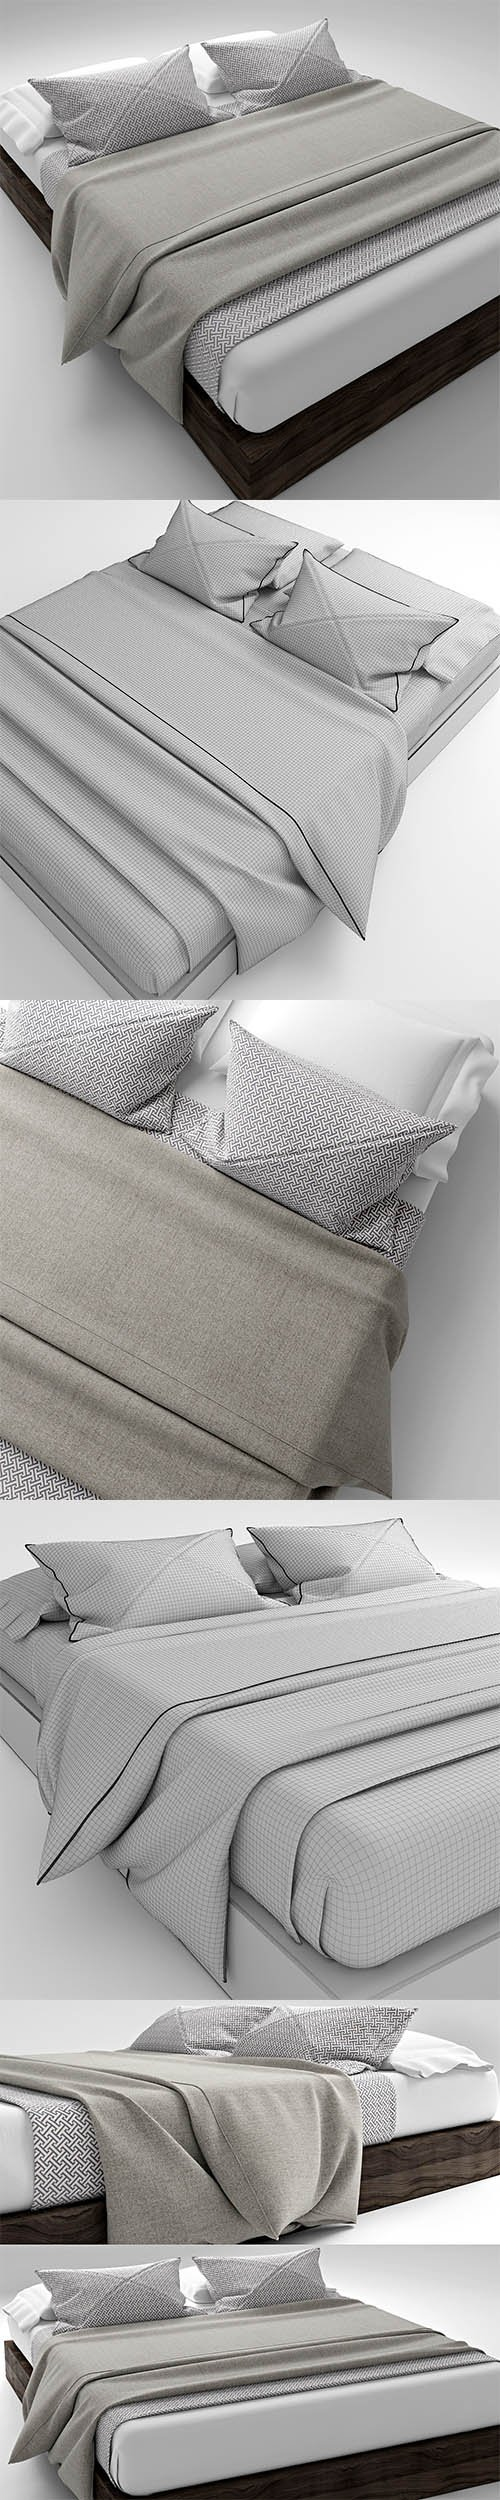 Bedclothes 7